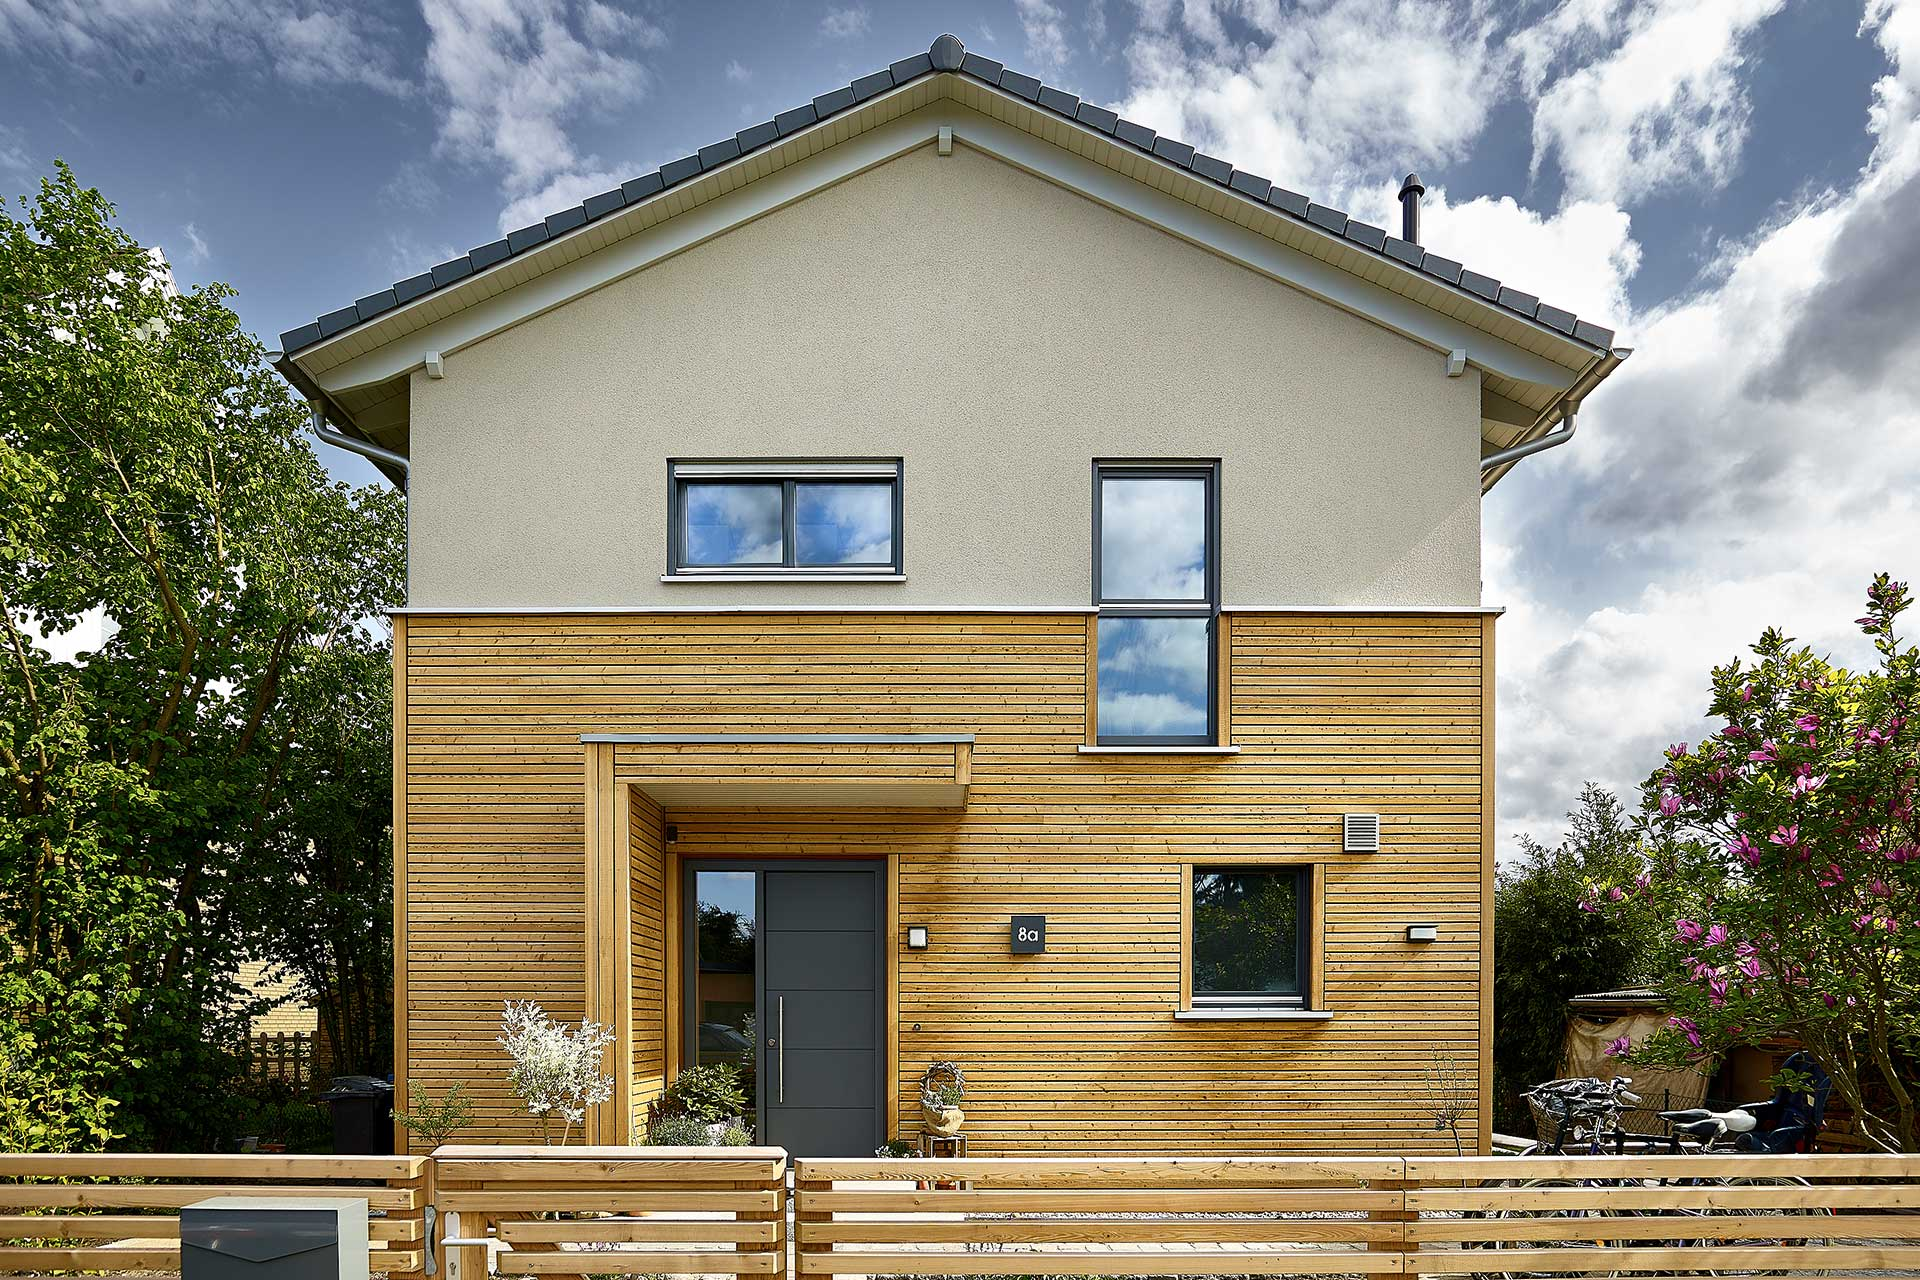 Modell Boavista   Fertighaus Mit Gelungenem Holz Putz Fassadenmix GUSSEK  HAUS